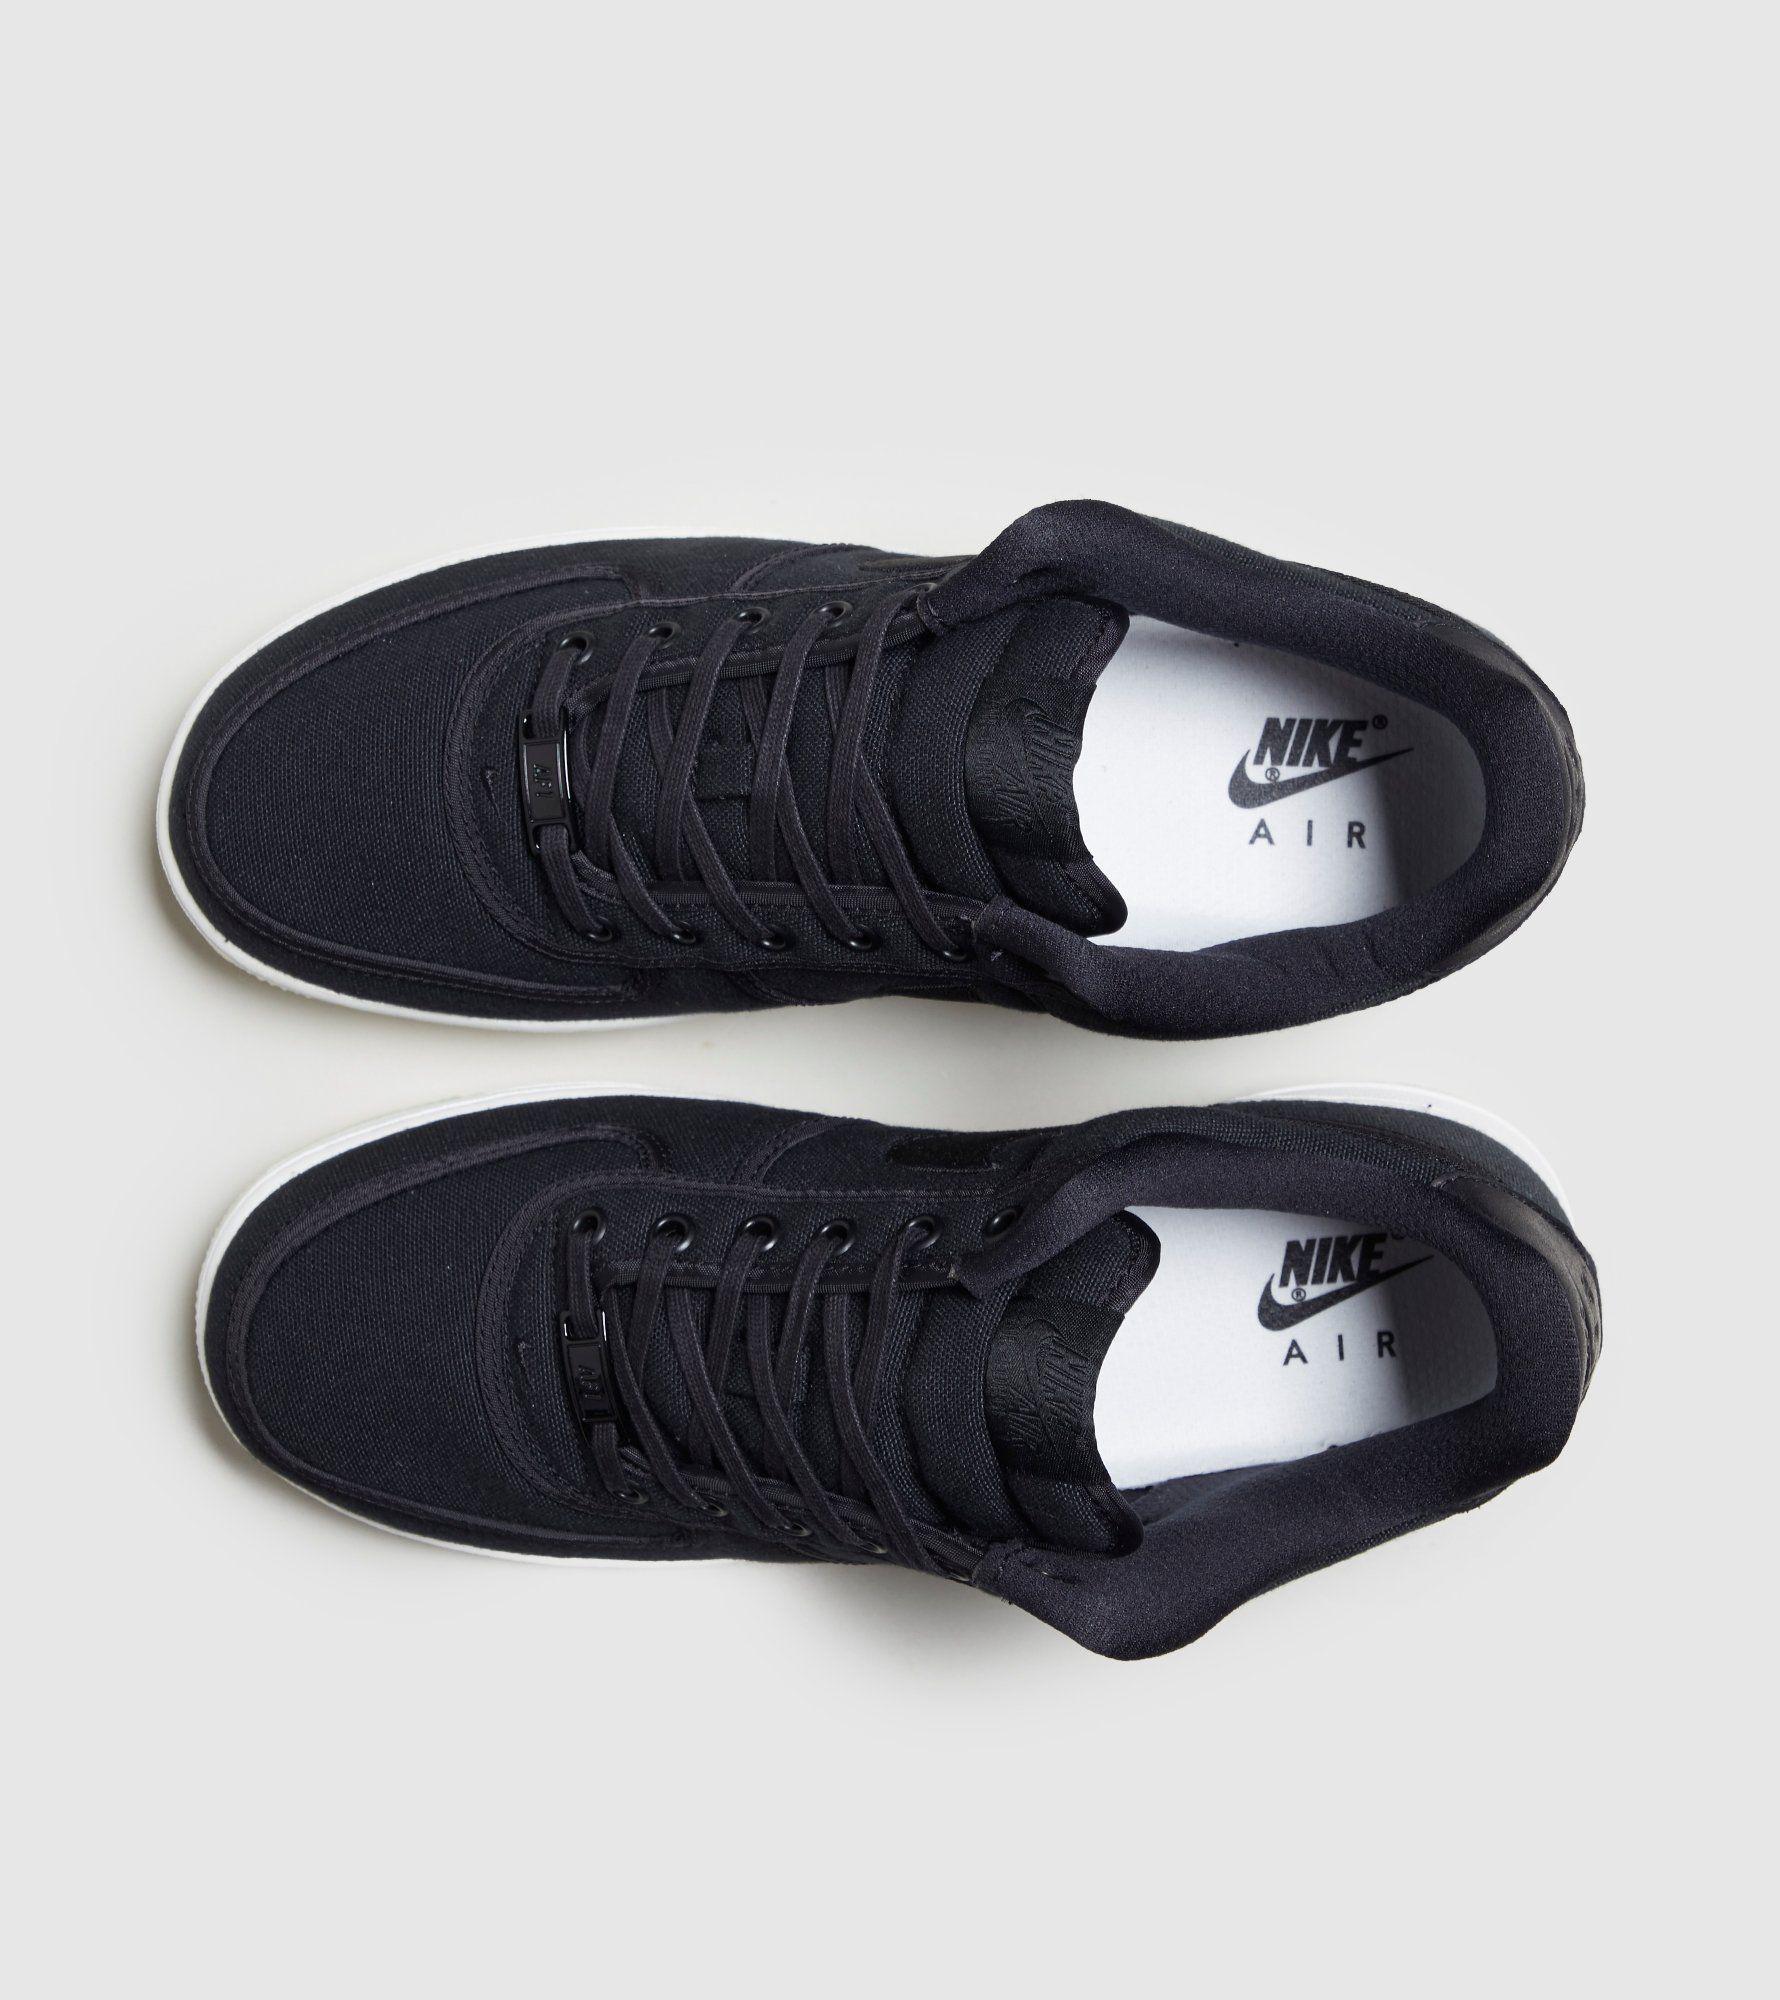 Nike Nike Air Force 1 Low Retro QS Canvas